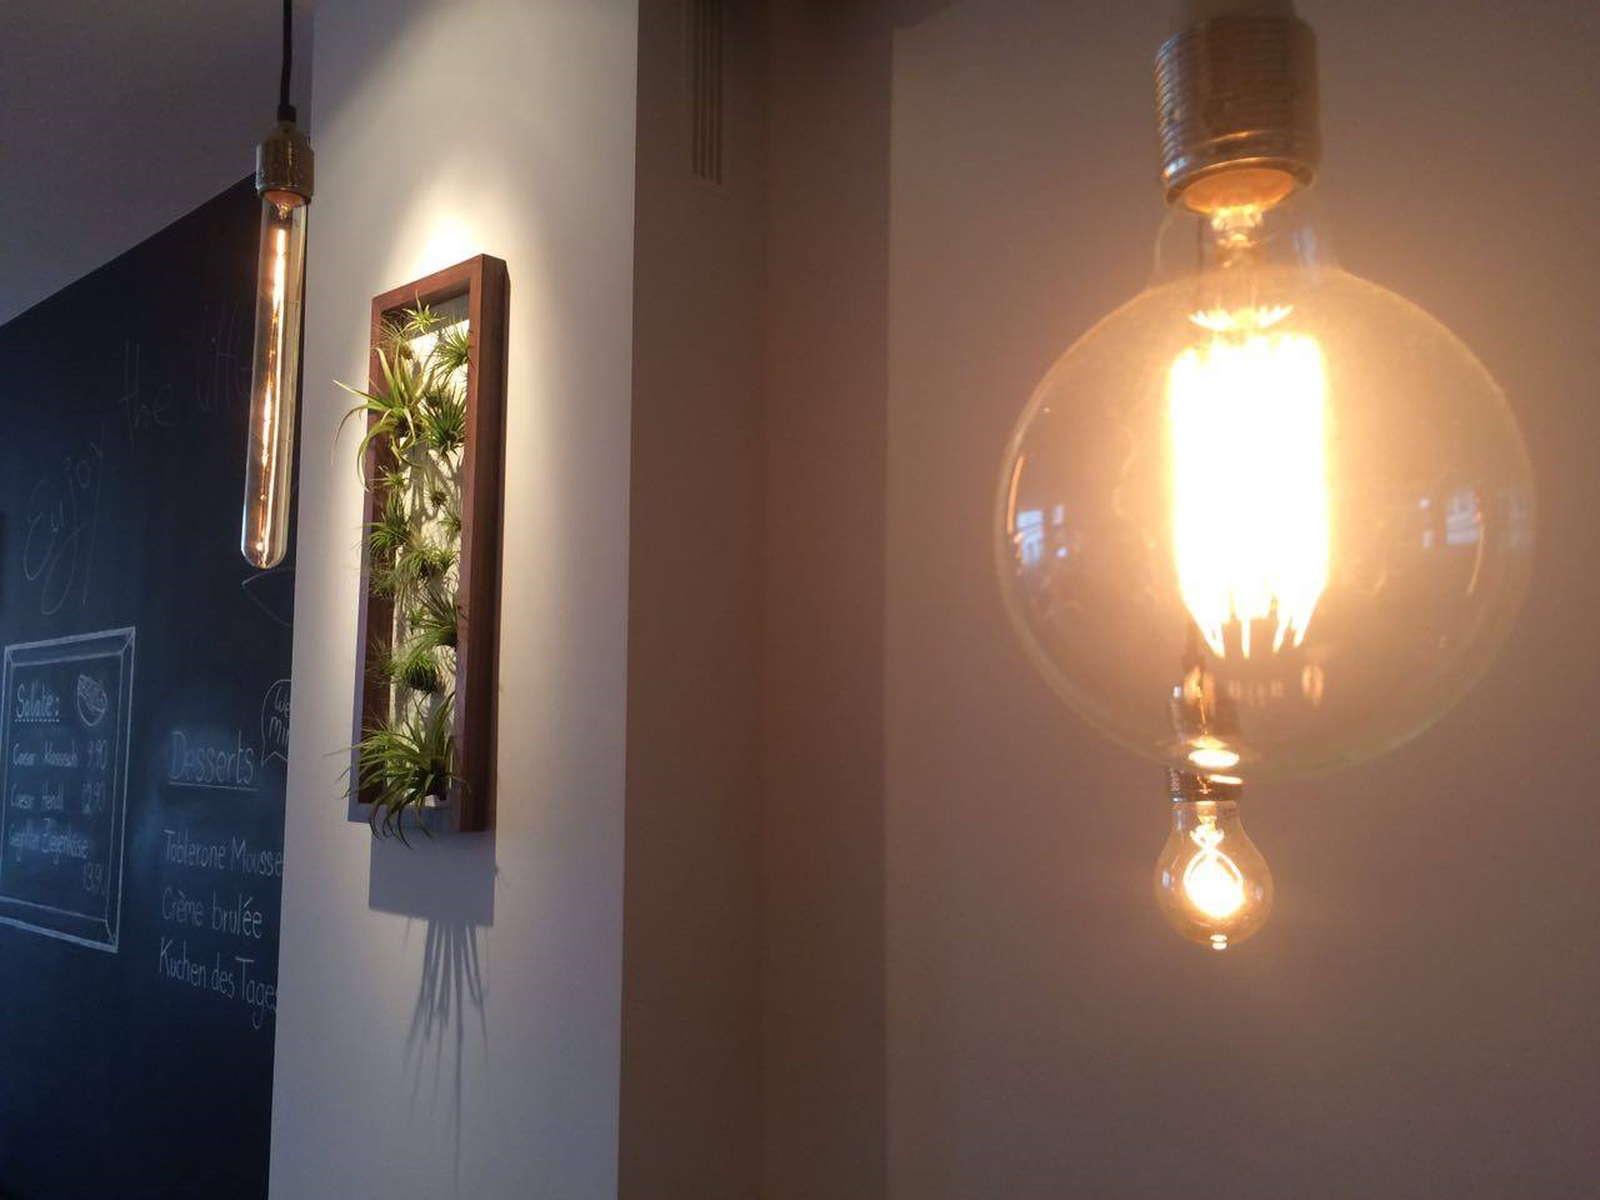 Lebende Wandbilder mit Tillandsien selbst basteln - Plantura